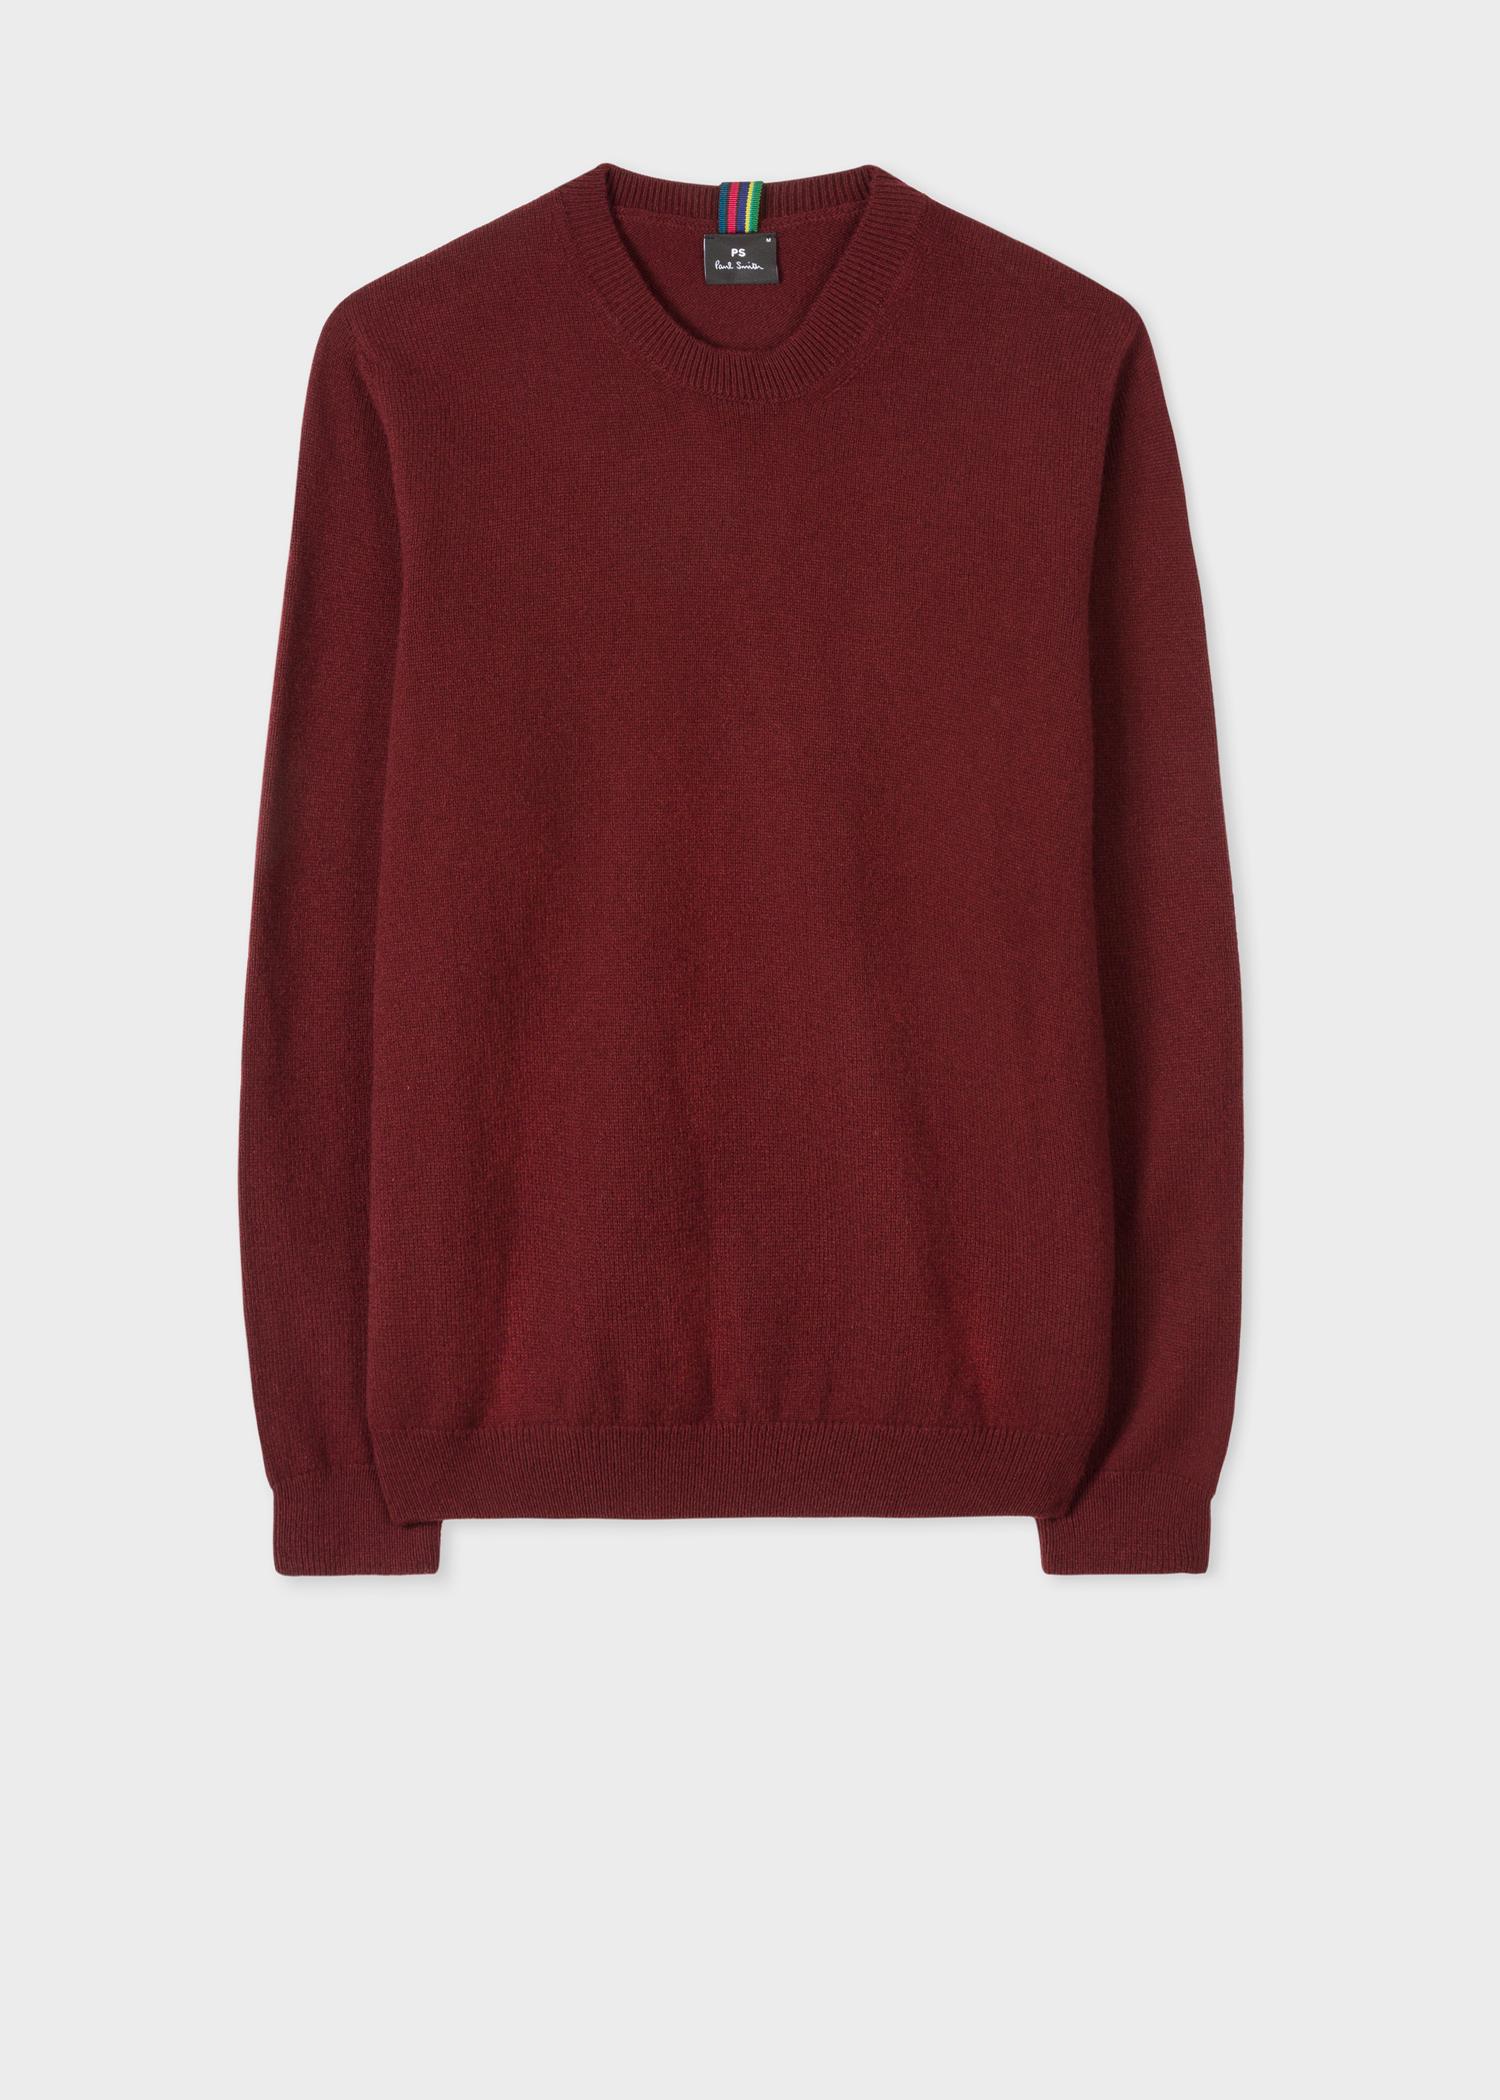 ce55f3b35 Men s Burgundy Lambswool Sweater - Paul Smith